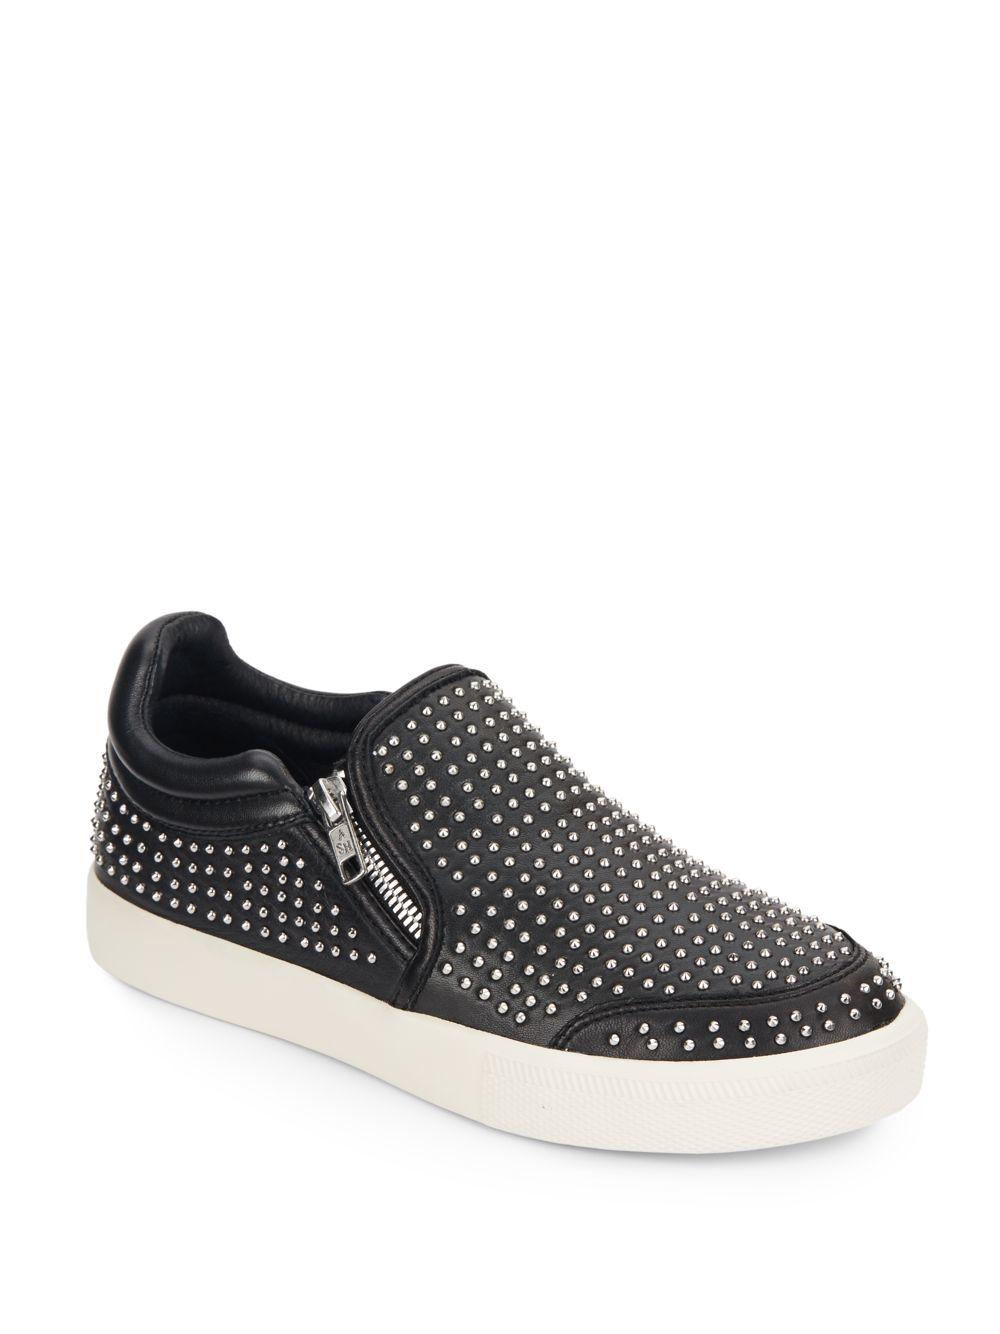 floral embroidered slip-on sneakers - Black Ash qiyALkw